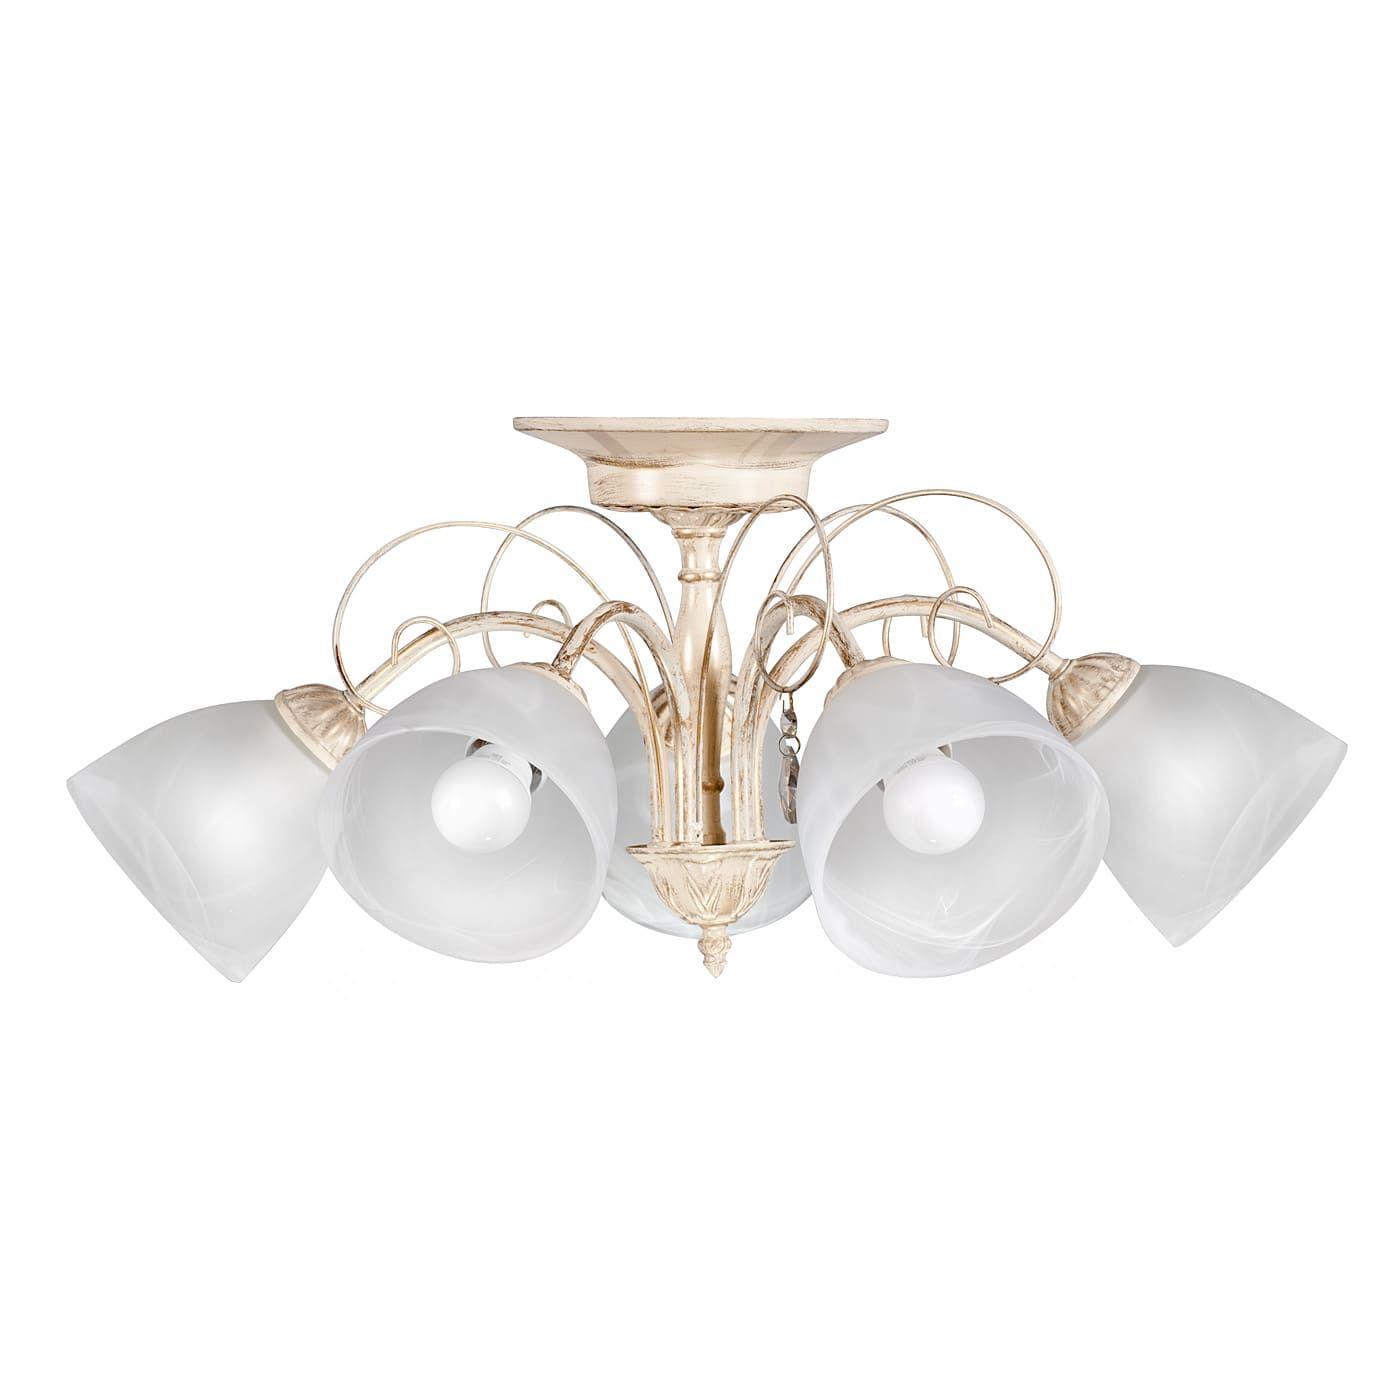 PETRASVET / Ceiling chandelier S2129-5, 5xE27 max. 60W